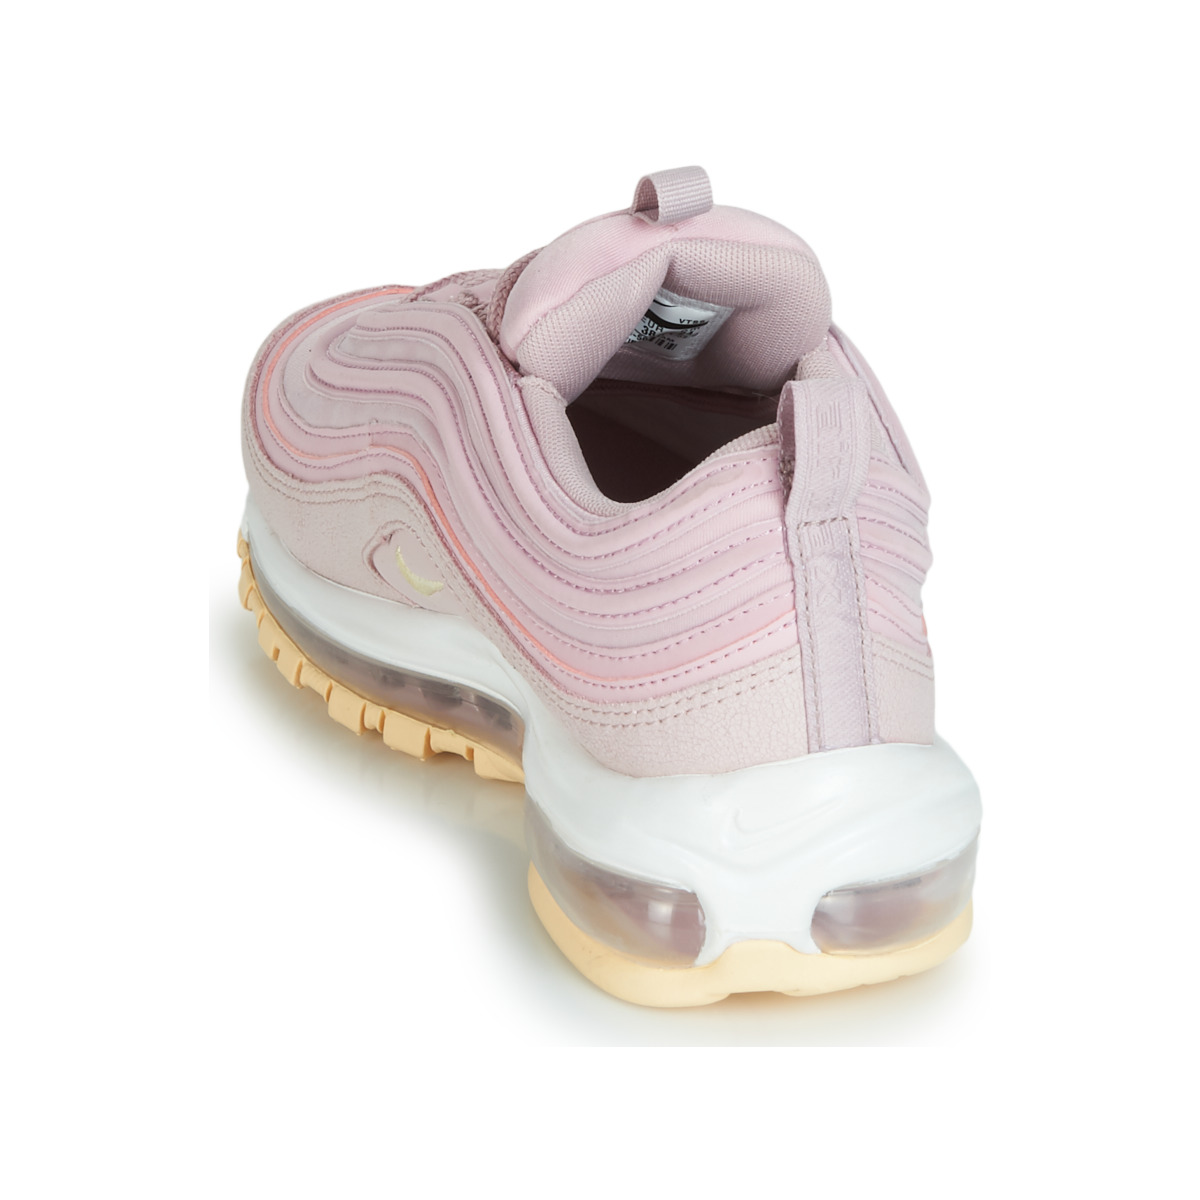 Nike AIR MAX '97 PREMIUM W Rosa 9929586 Consegna Gratuita OutletScarpeOnline.it